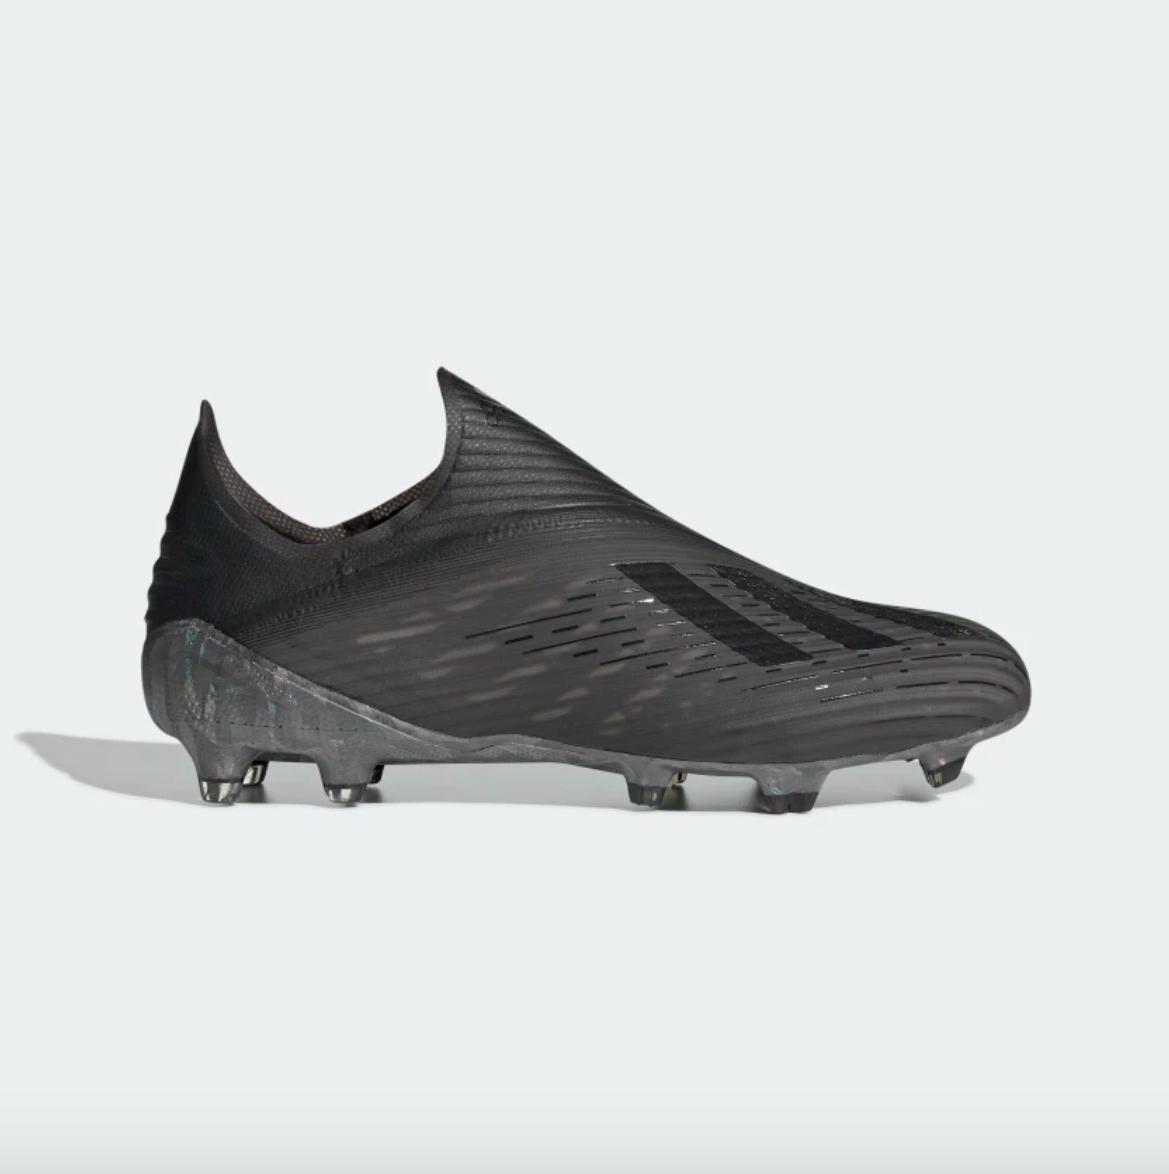 adidas-x-19-pack-dark-script-1